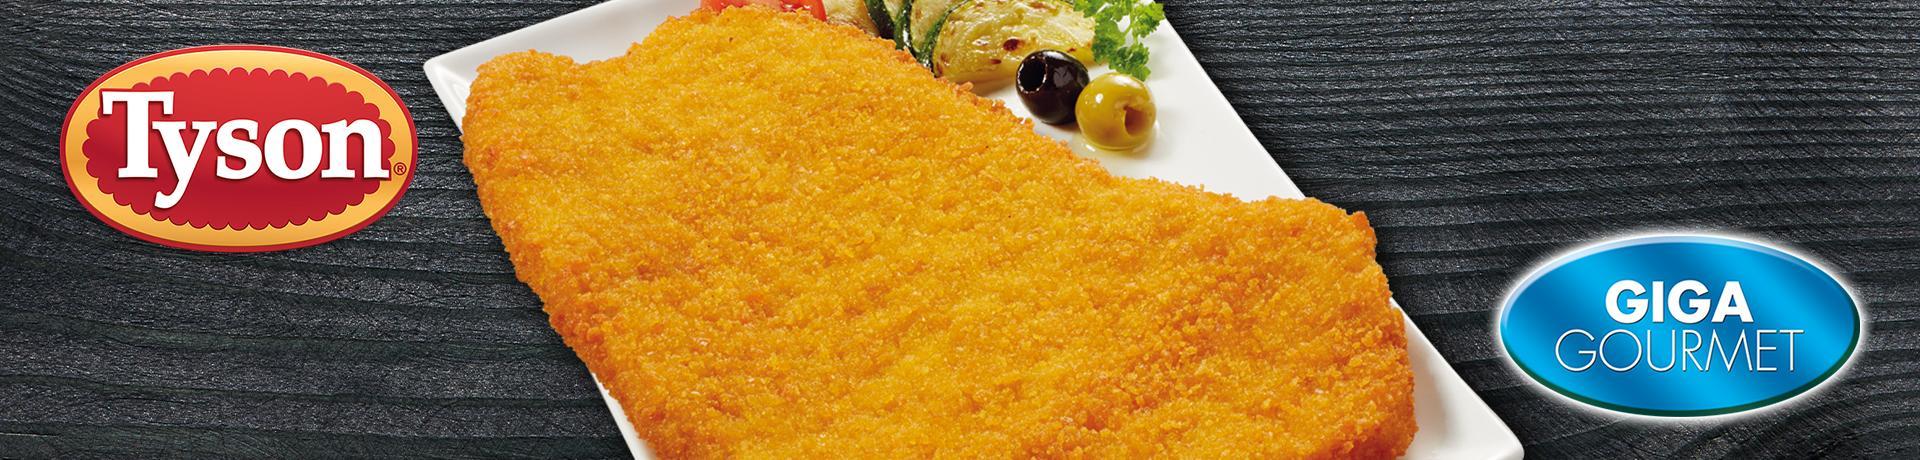 Linea Giga Gourmet